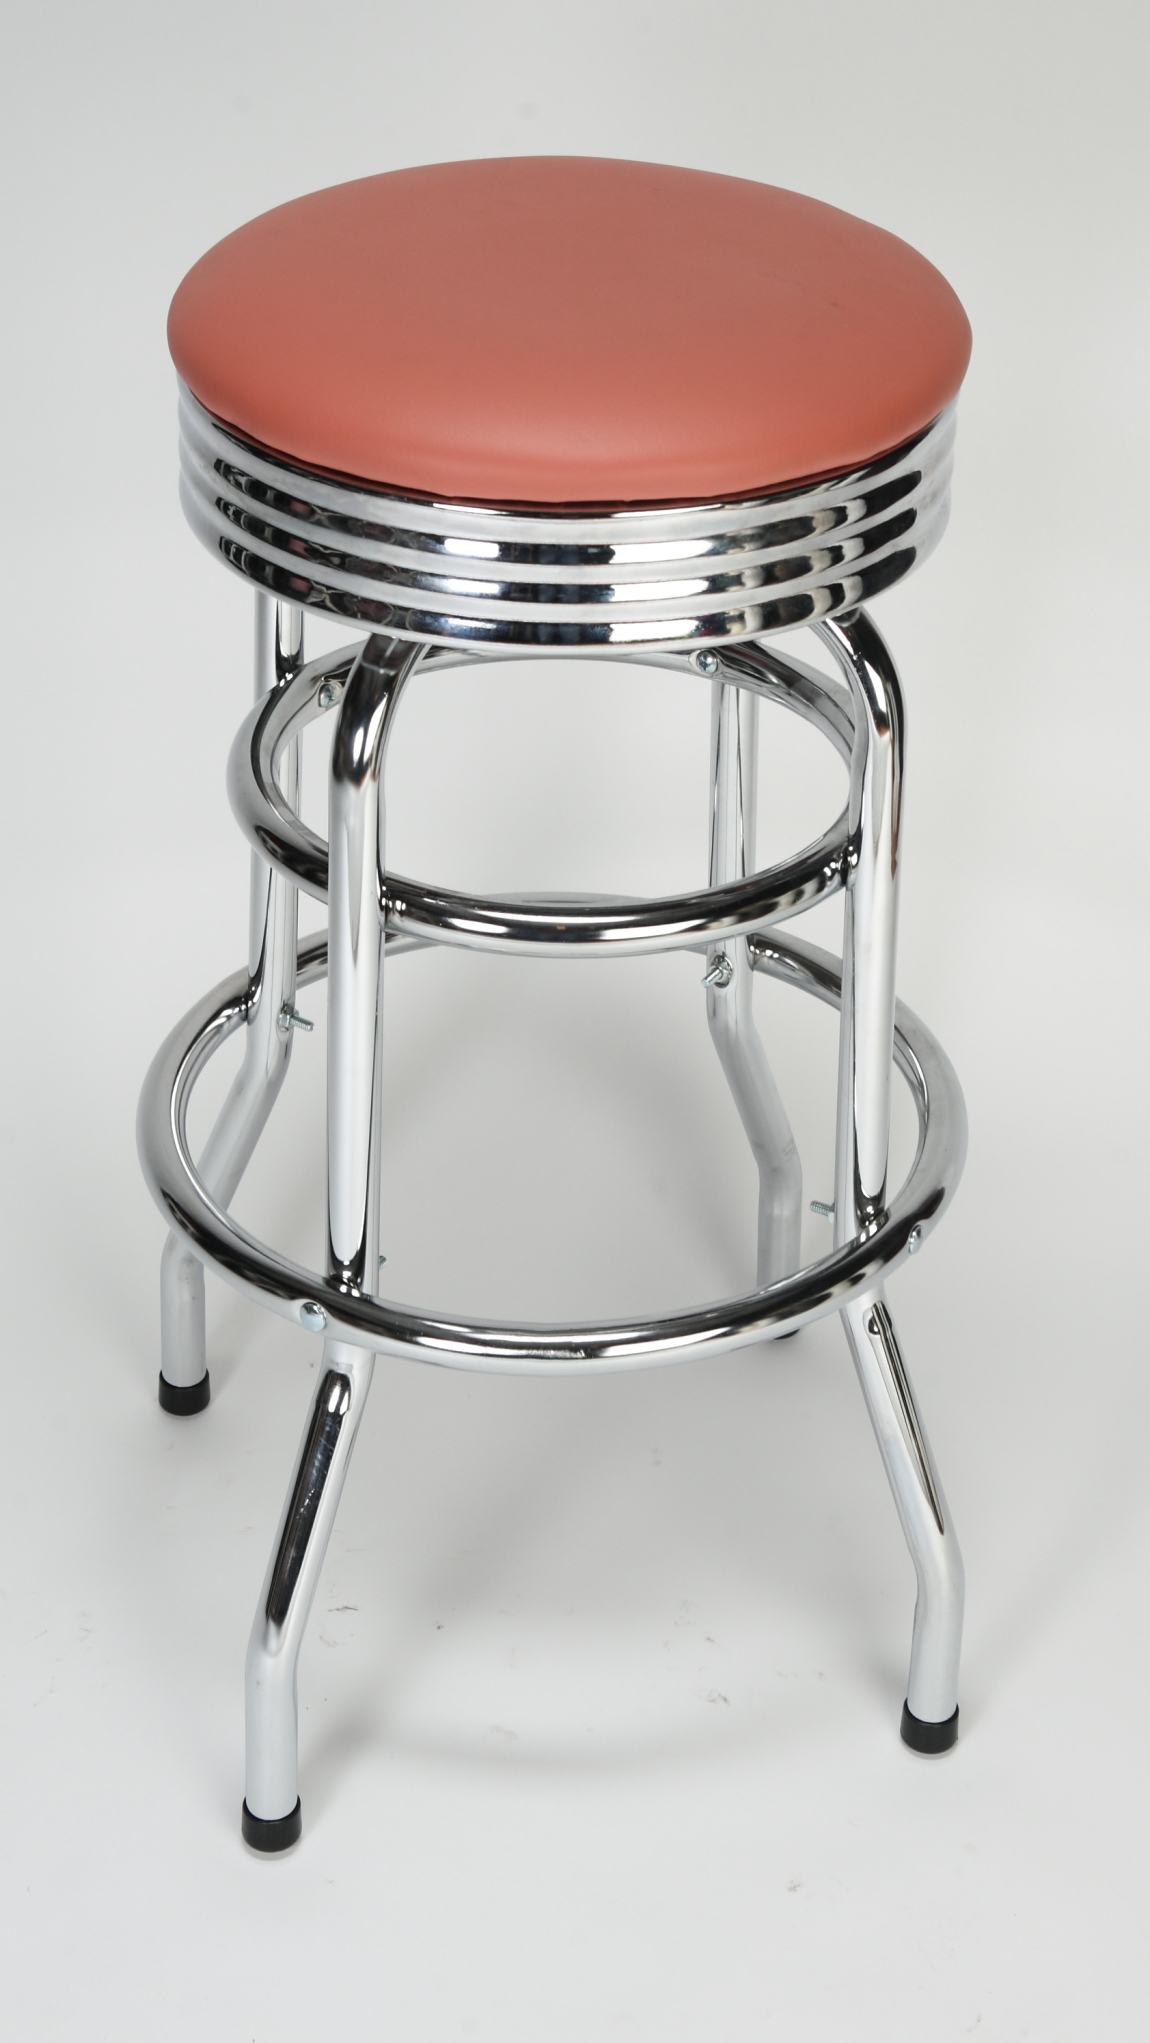 Chrome circle swivel bar stool restaurant furniture